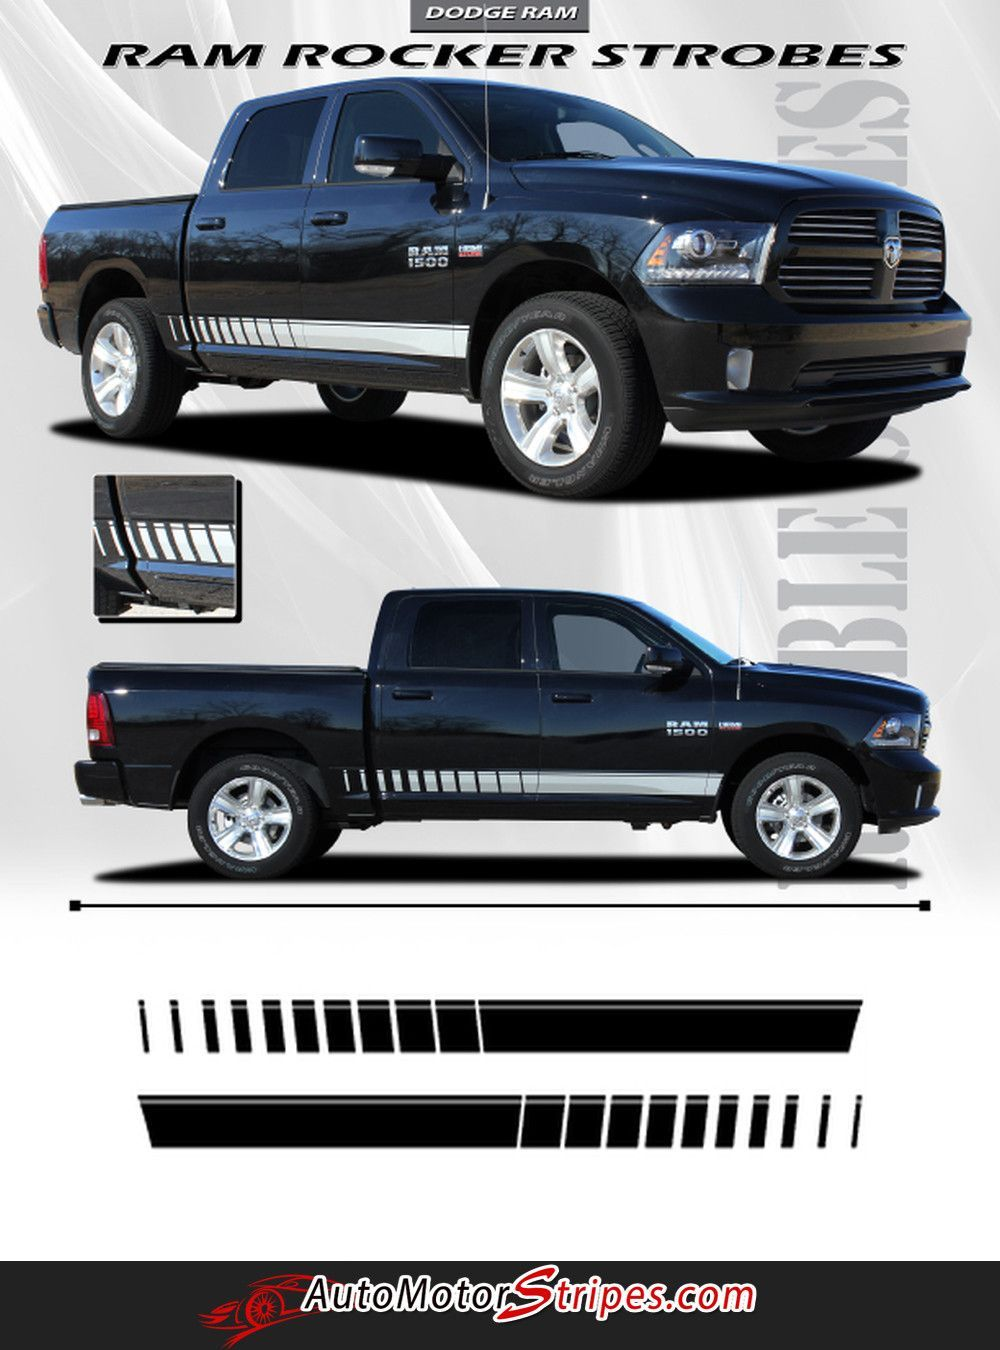 vehicle specific style dodge ram truck lower rocker panel strobe vinyl graphic stripe decals year fitment 2009 2010 2011 2012 2013 2014 2015 2016 contents  [ 1000 x 1350 Pixel ]